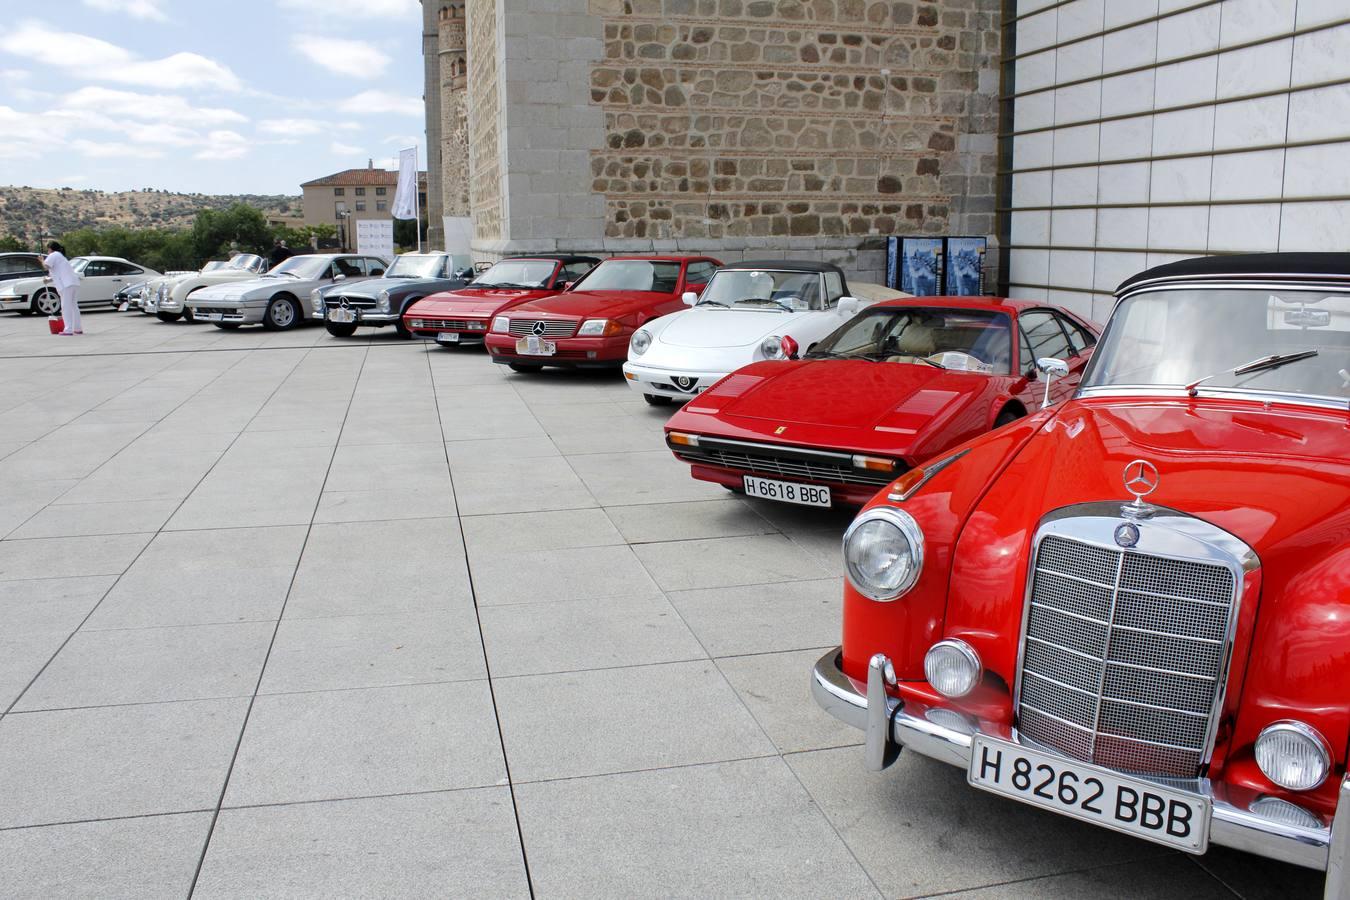 coches-toledo_xoptimizadax.jpg